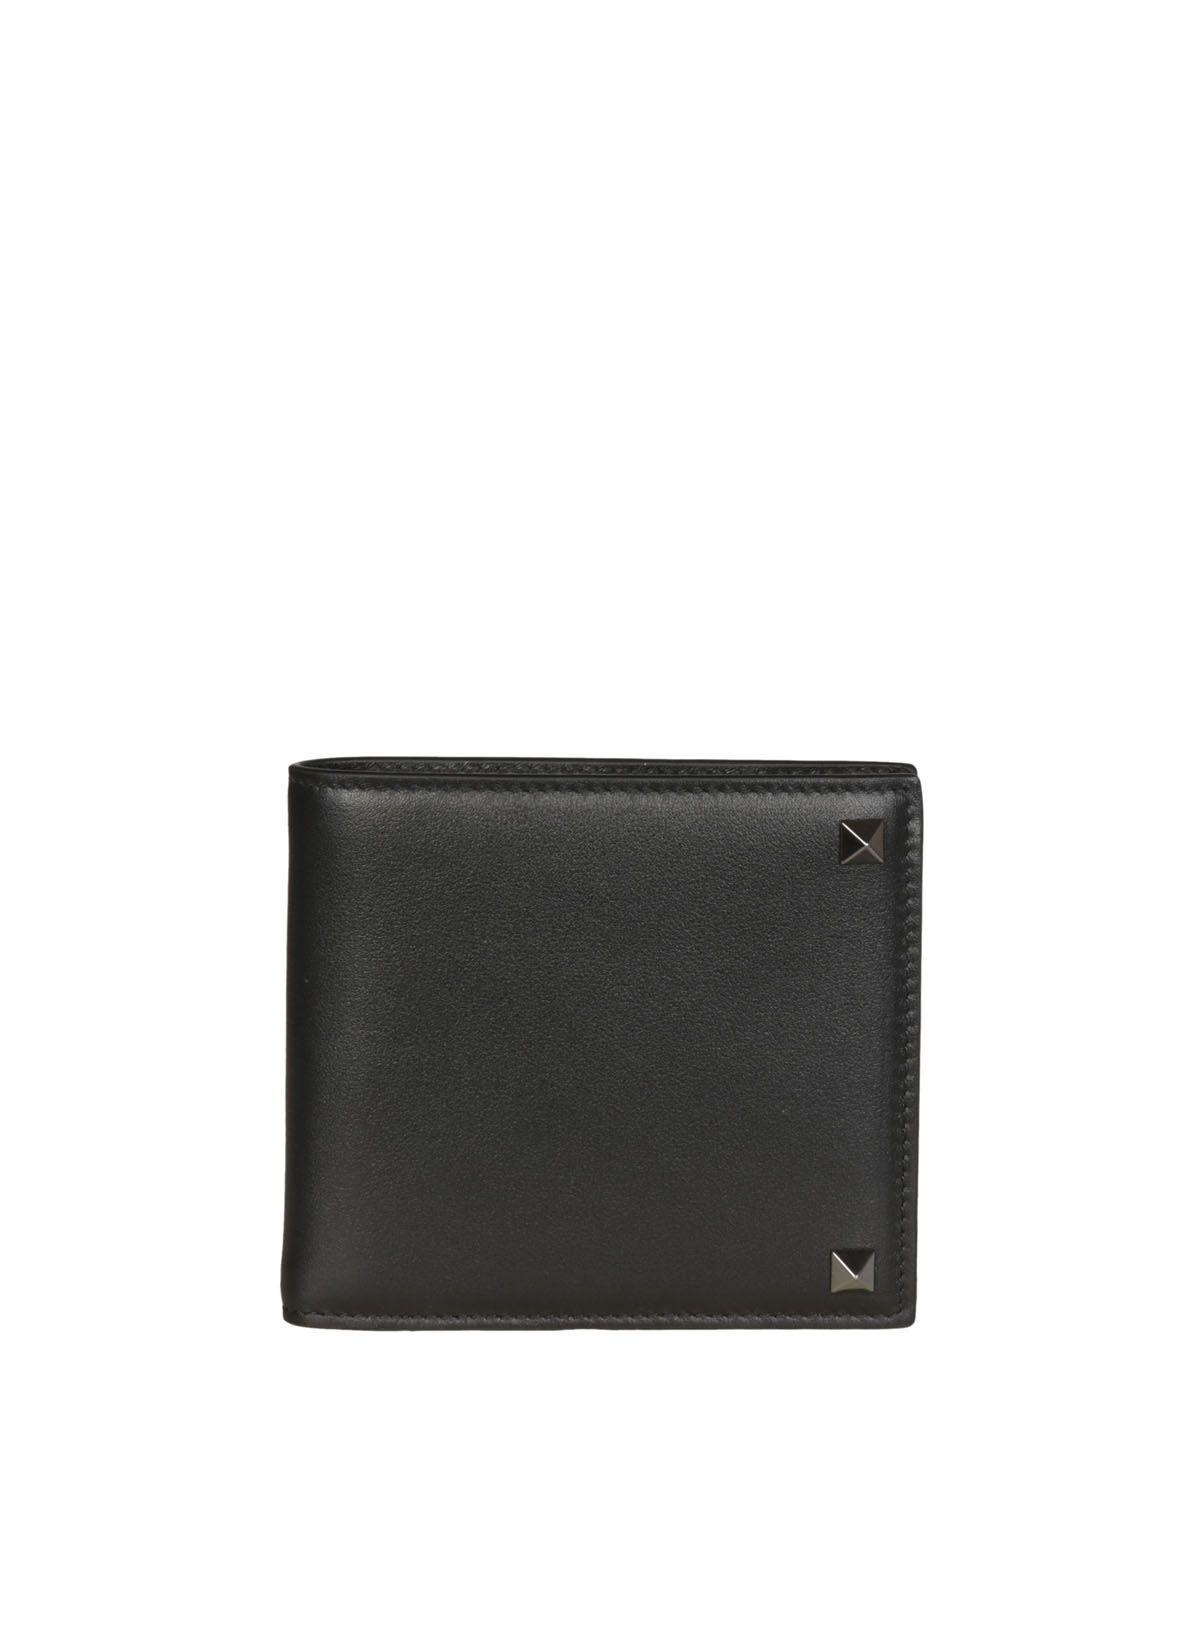 Valentino Valentino Rockstud Camouflage Wallet